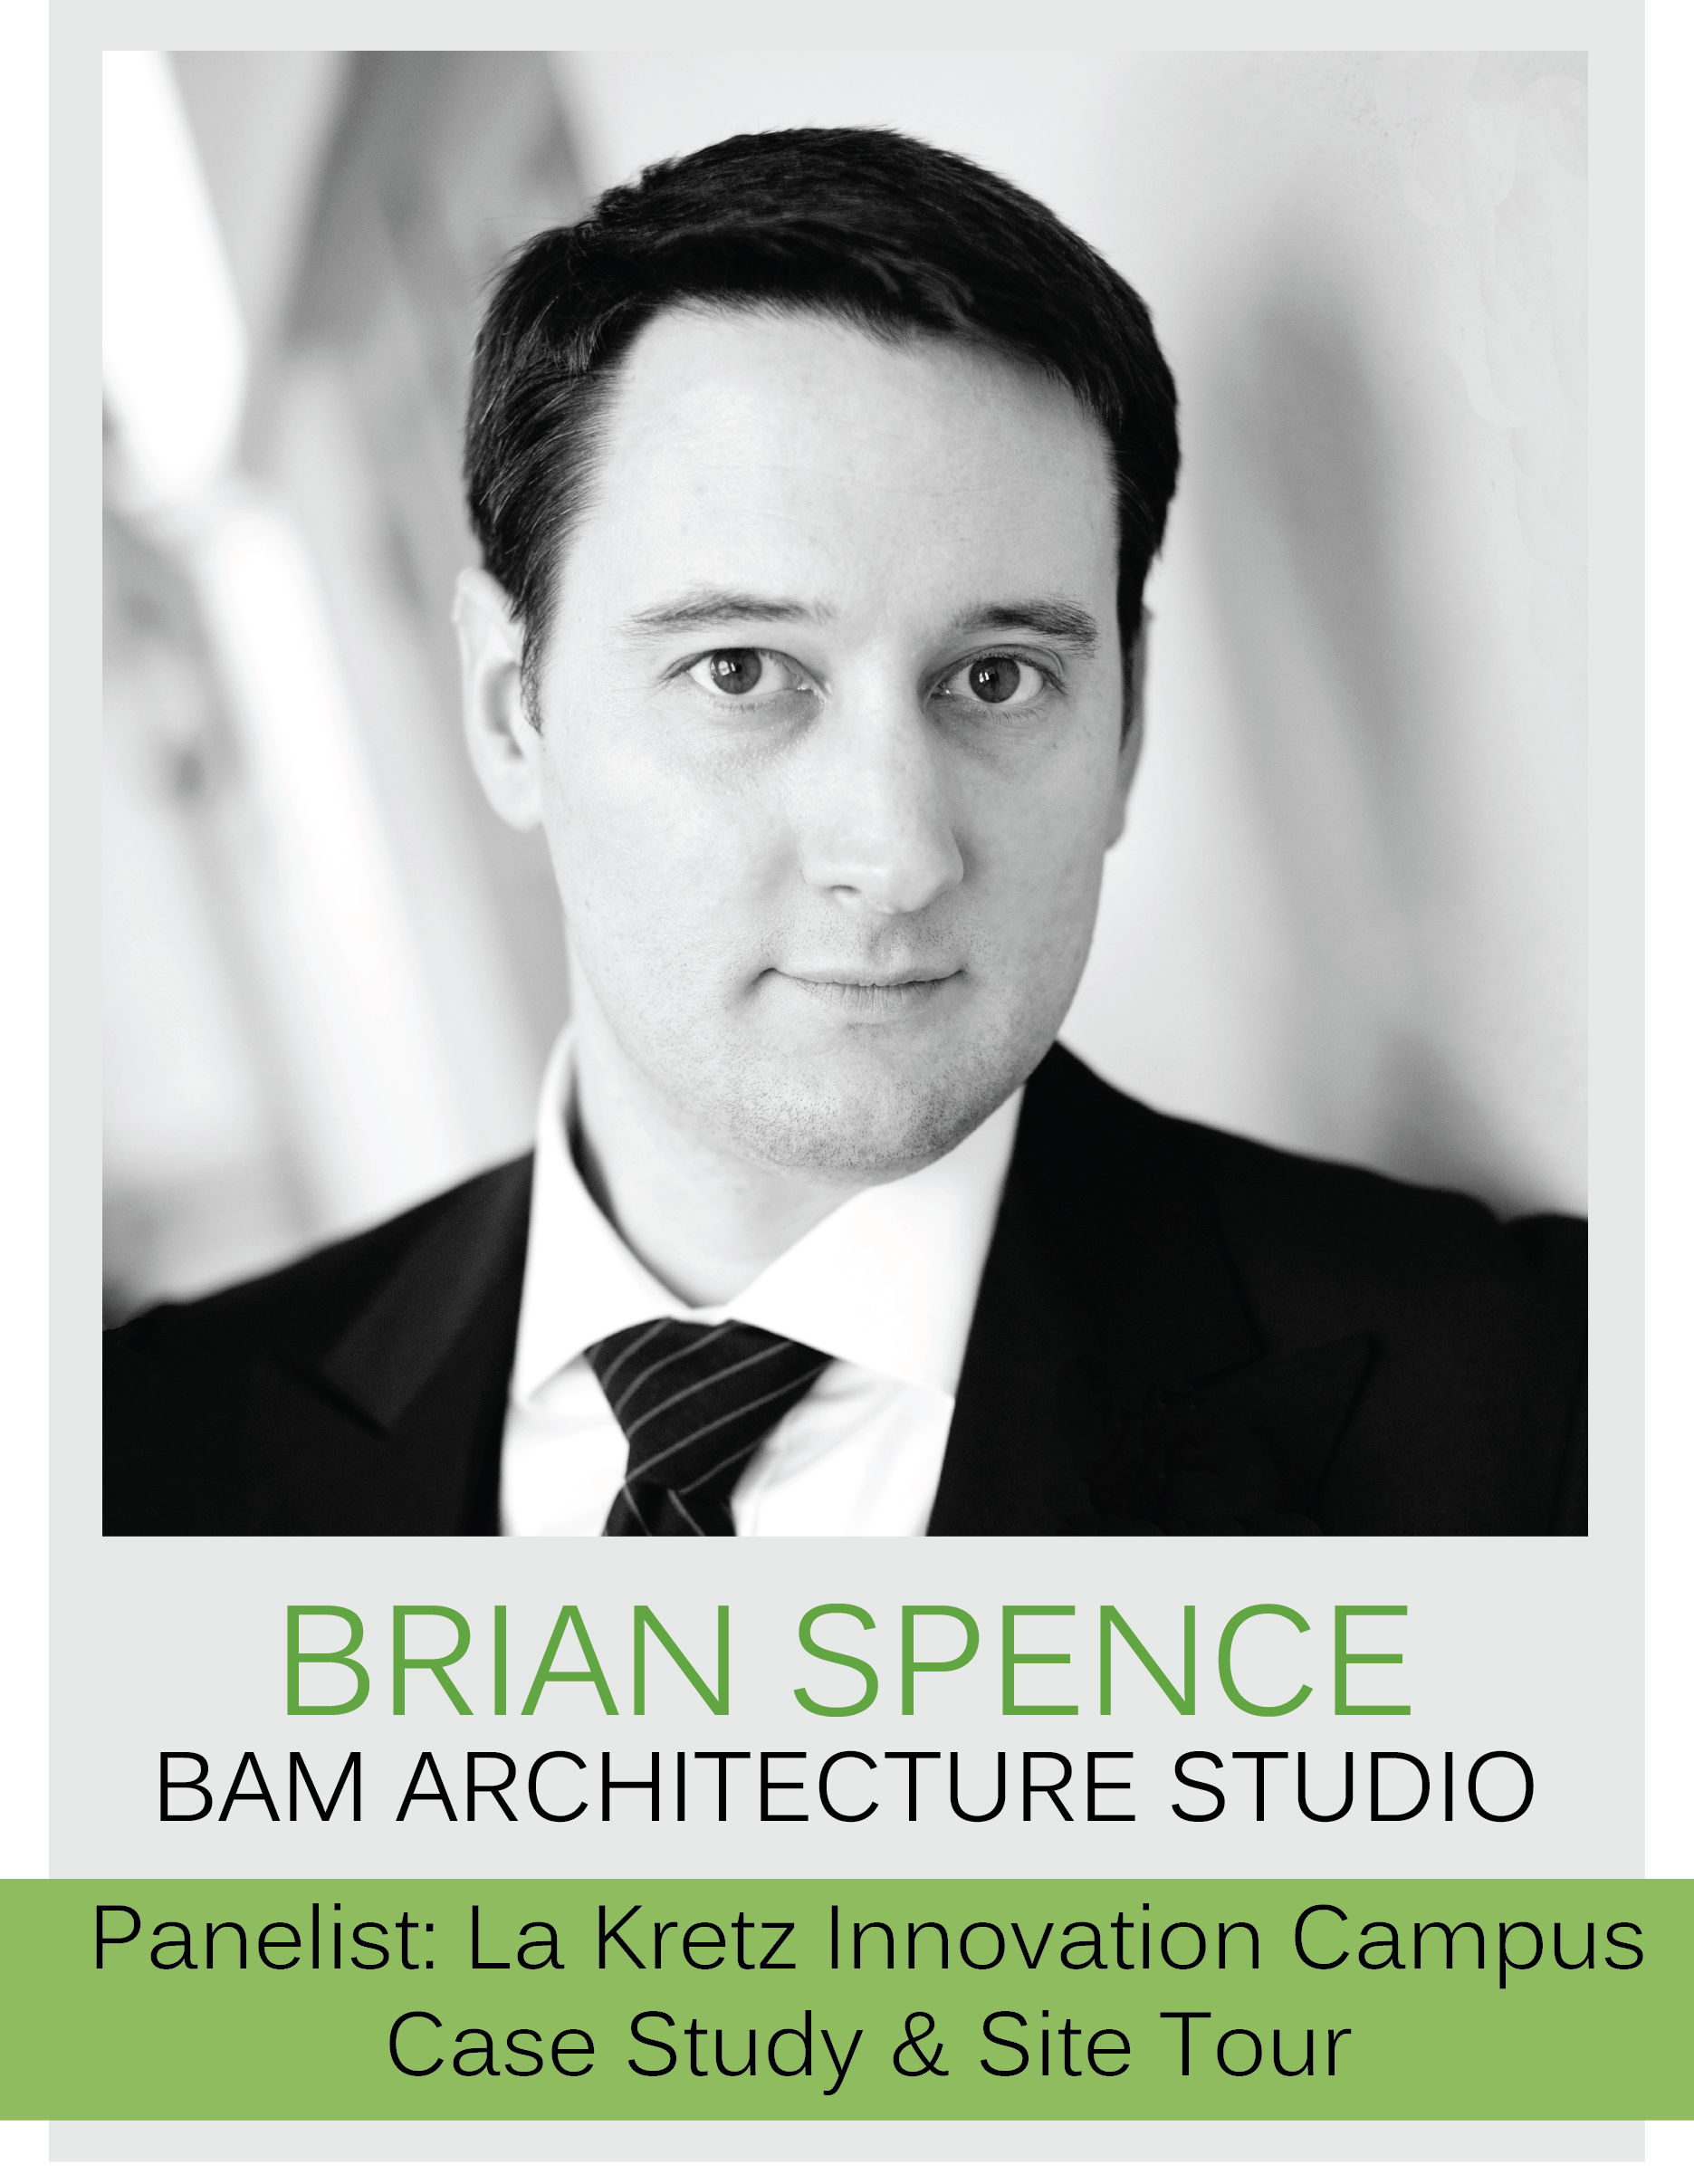 Brian Spence - ULI LA 2